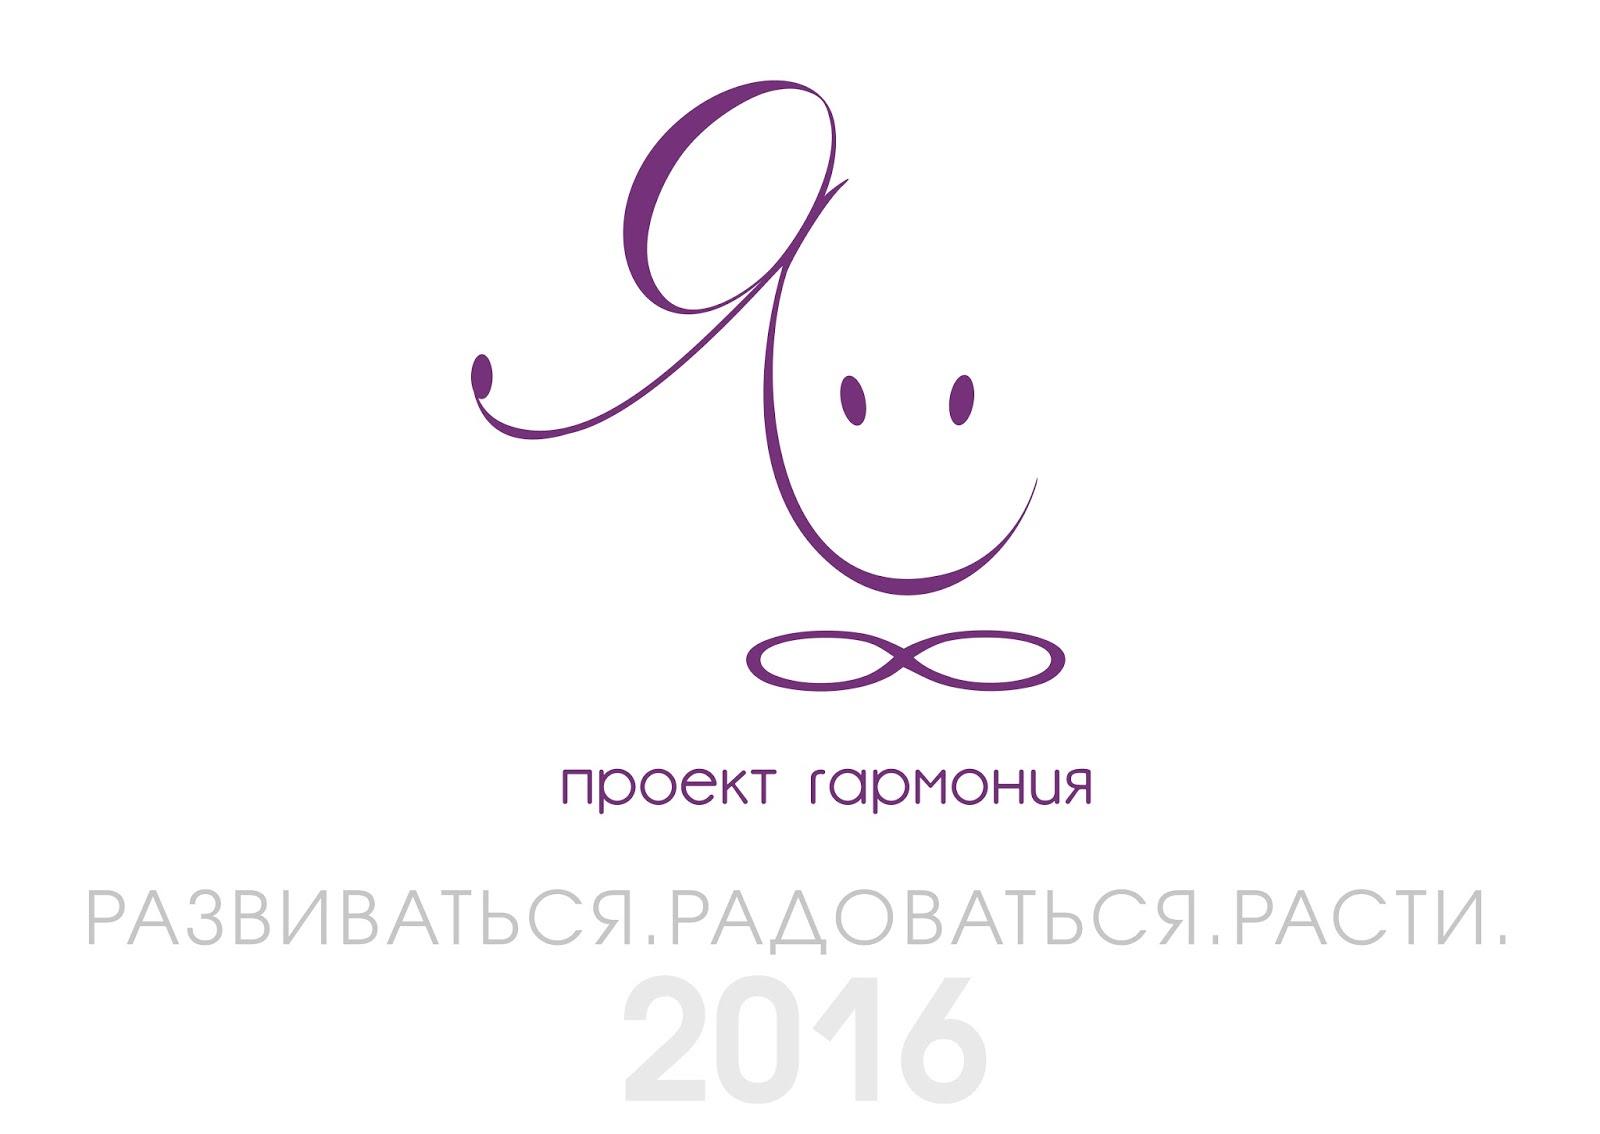 календарь на 2016 год картинка на рабочий стол wallpaper